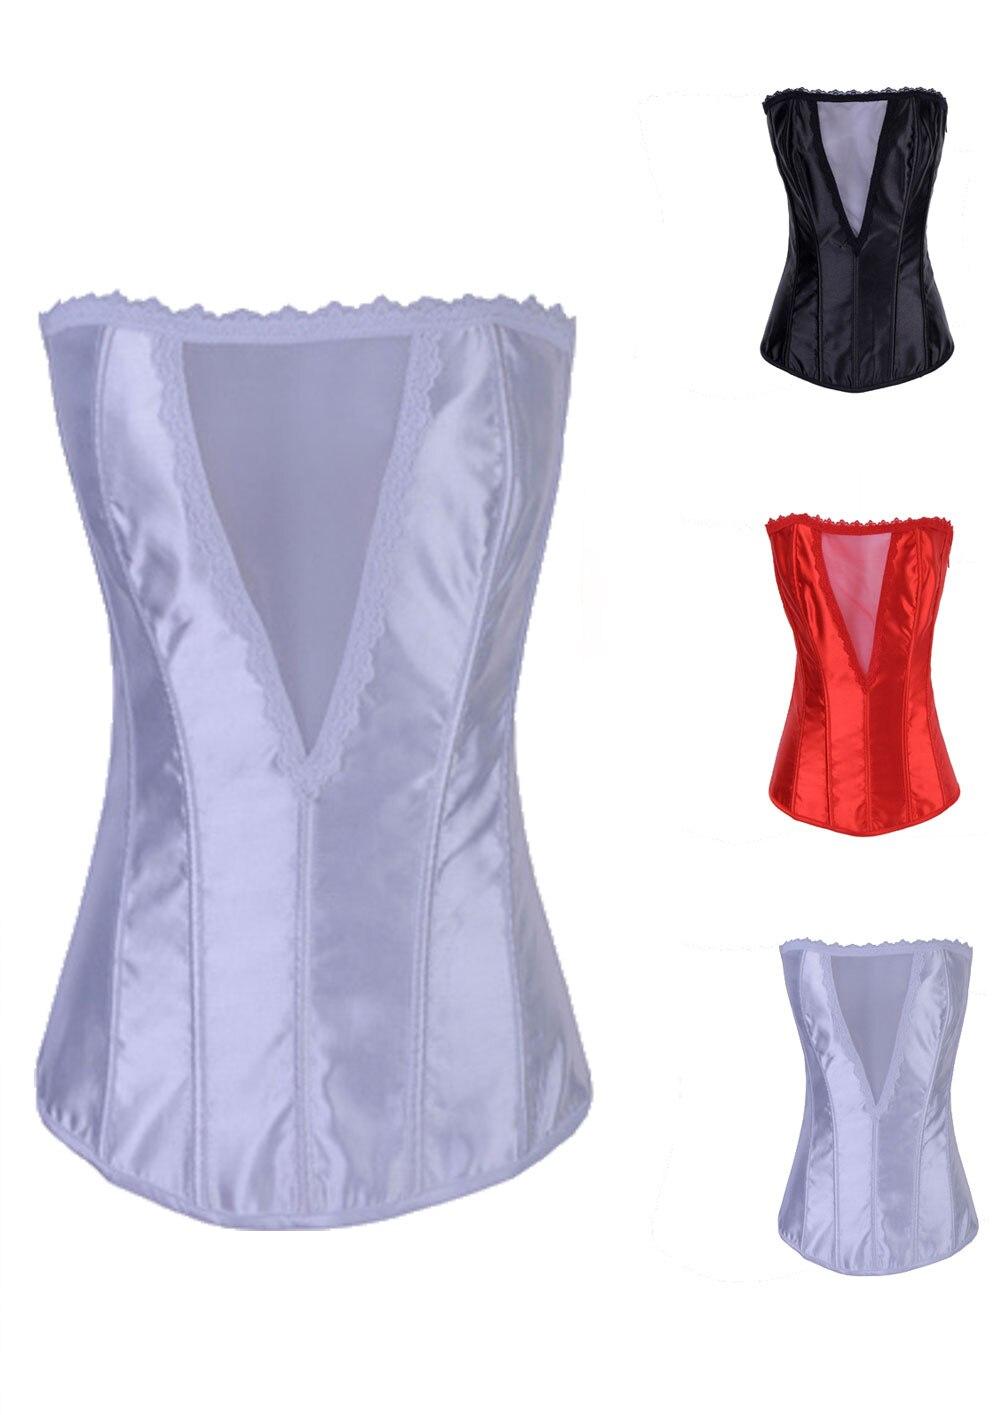 Corzzet Balck /Red/White Satin Lingerie   Corset   Double Boned Waist slimming Overbust Burlesque Wedding   Corset   Gothic Clothing